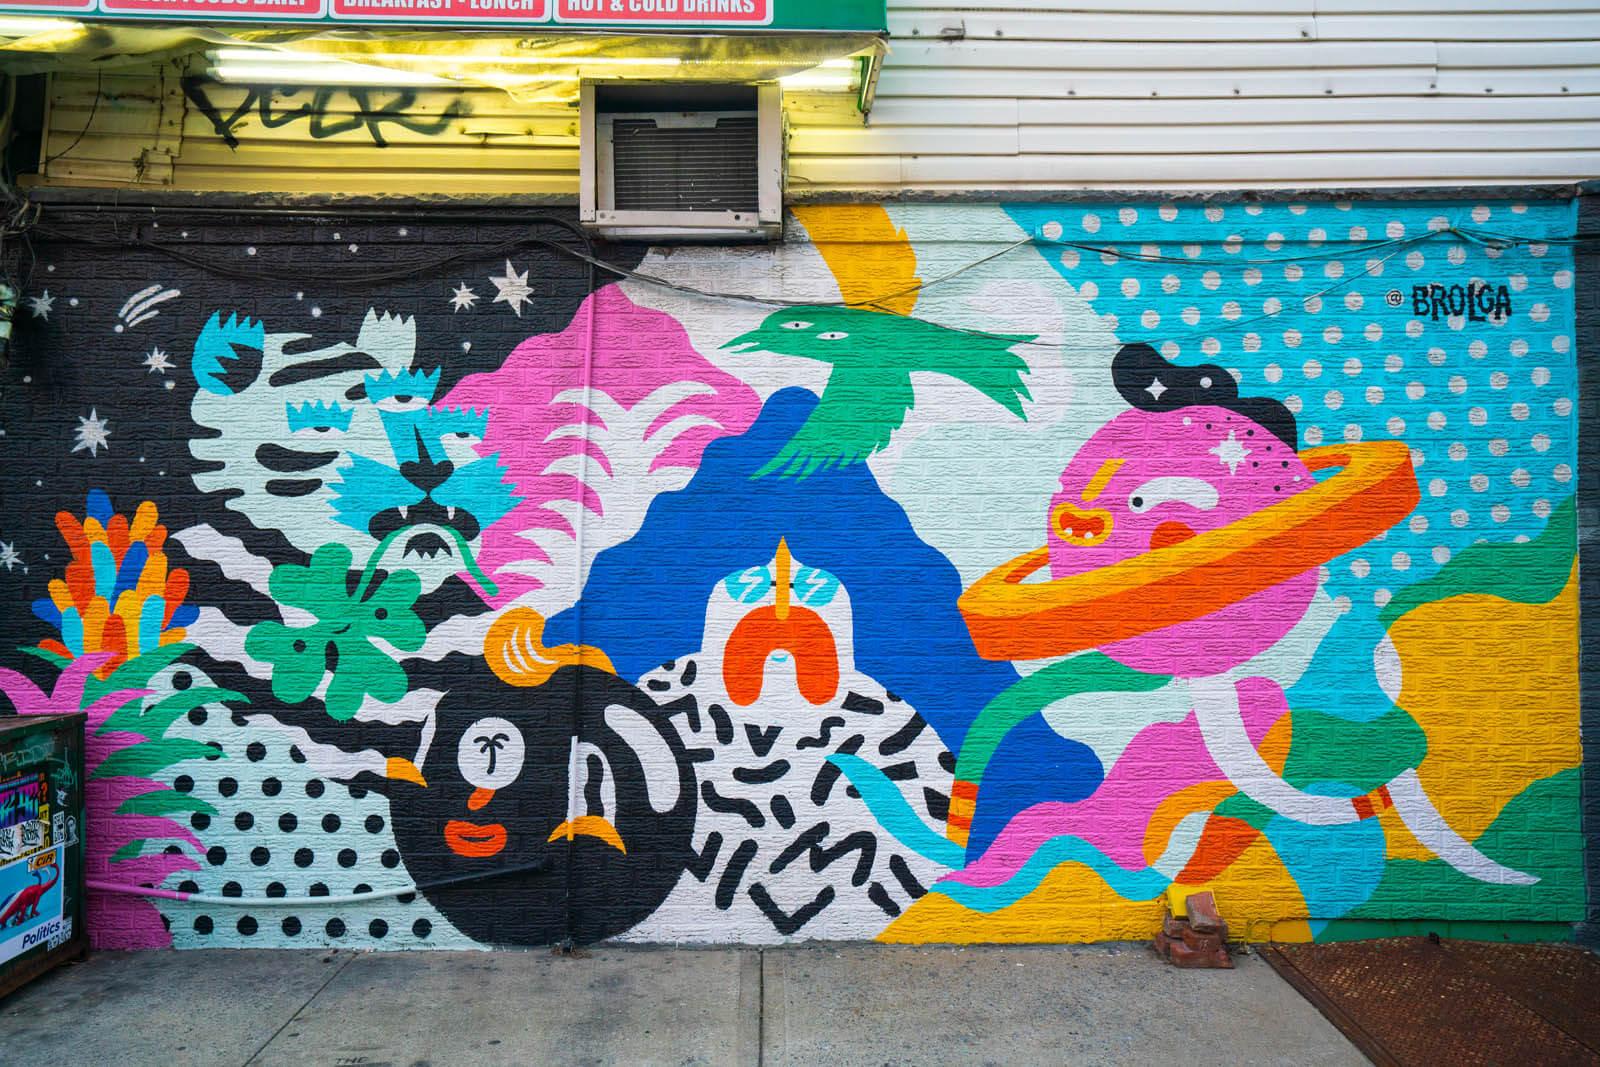 Brolga Mural in Williamsburg Brooklyn on Manhattan Ave